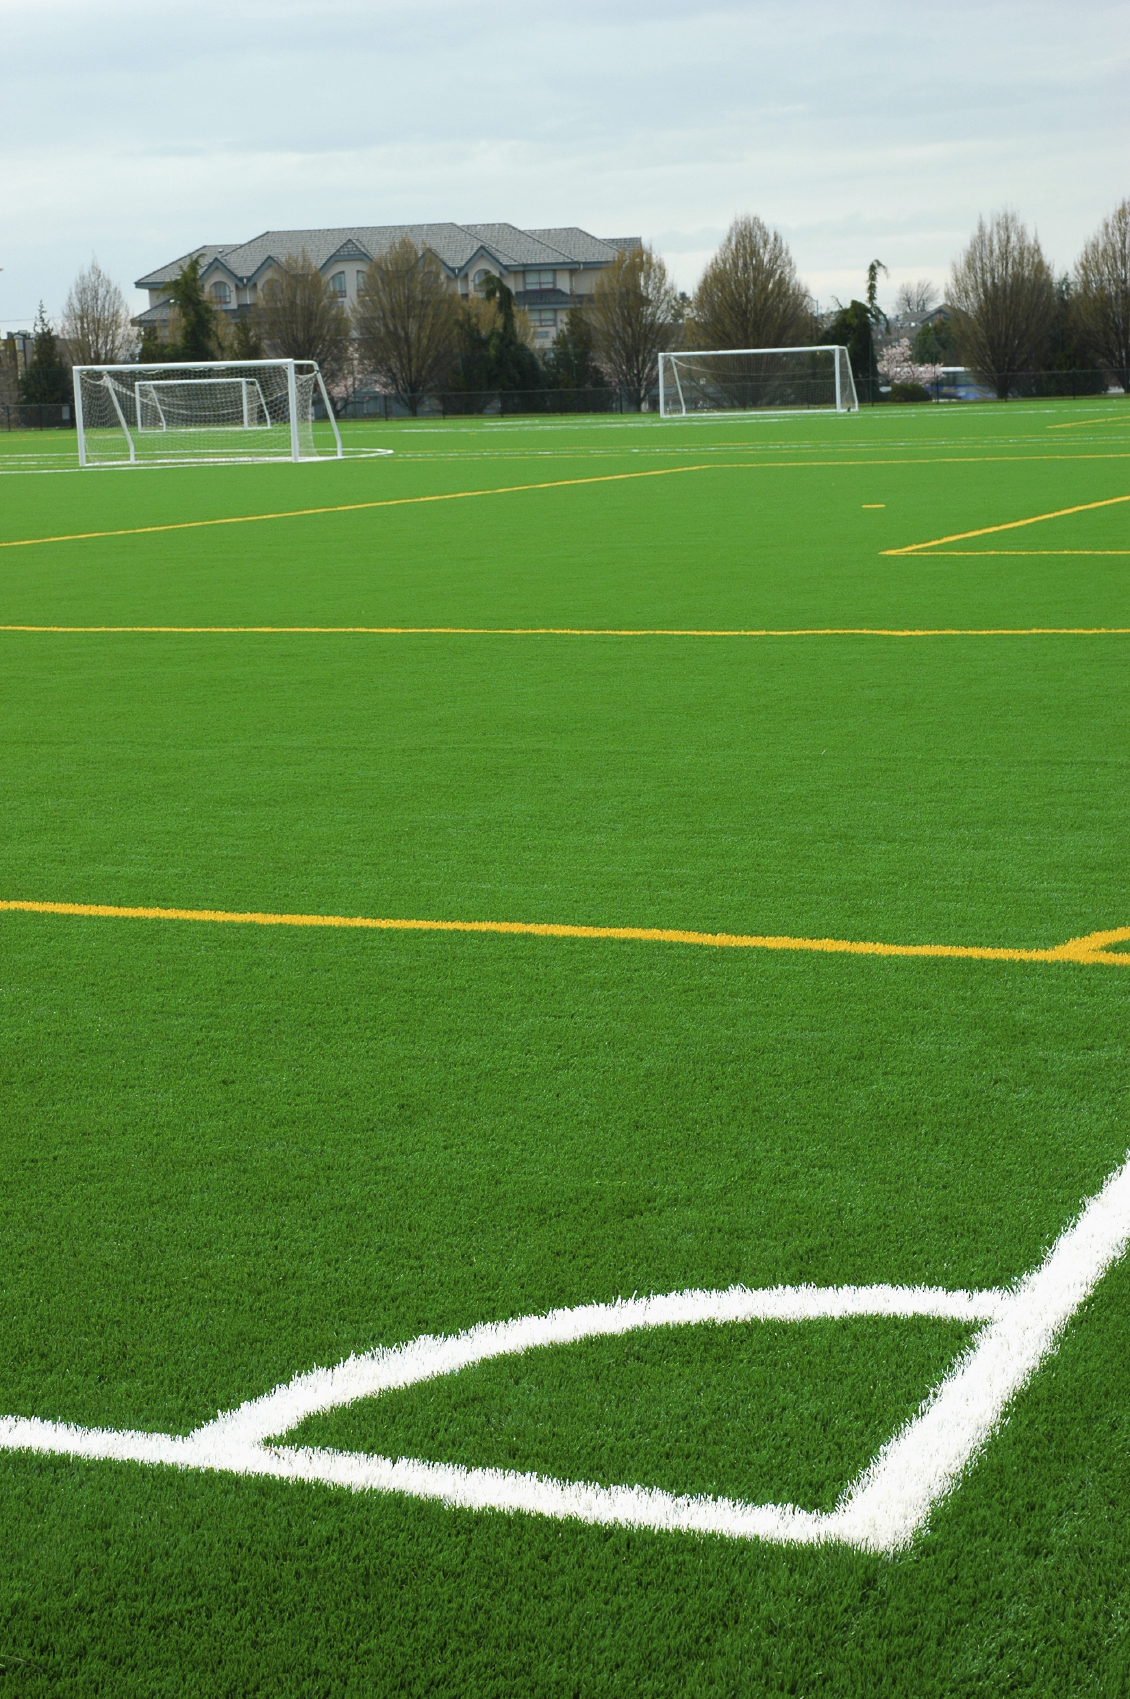 commercial-artificial-turf-soccer-field-internal-4.jpg